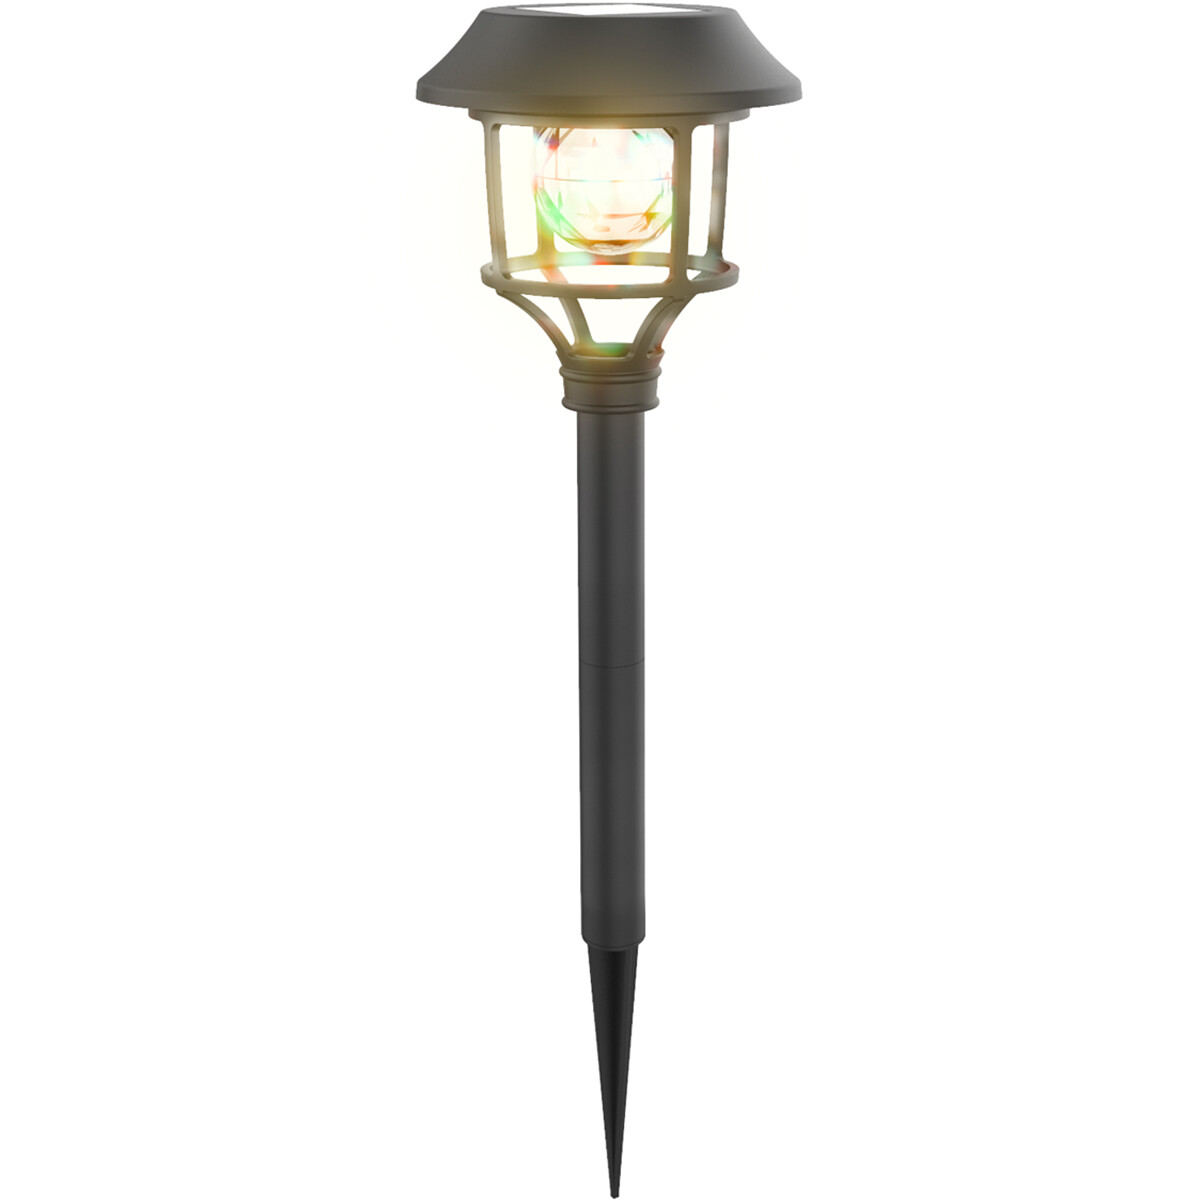 LED Priklamp met Zonne-energie - Aigi Haki - 0.08W - RGB - Mat Zwart - Kunststof